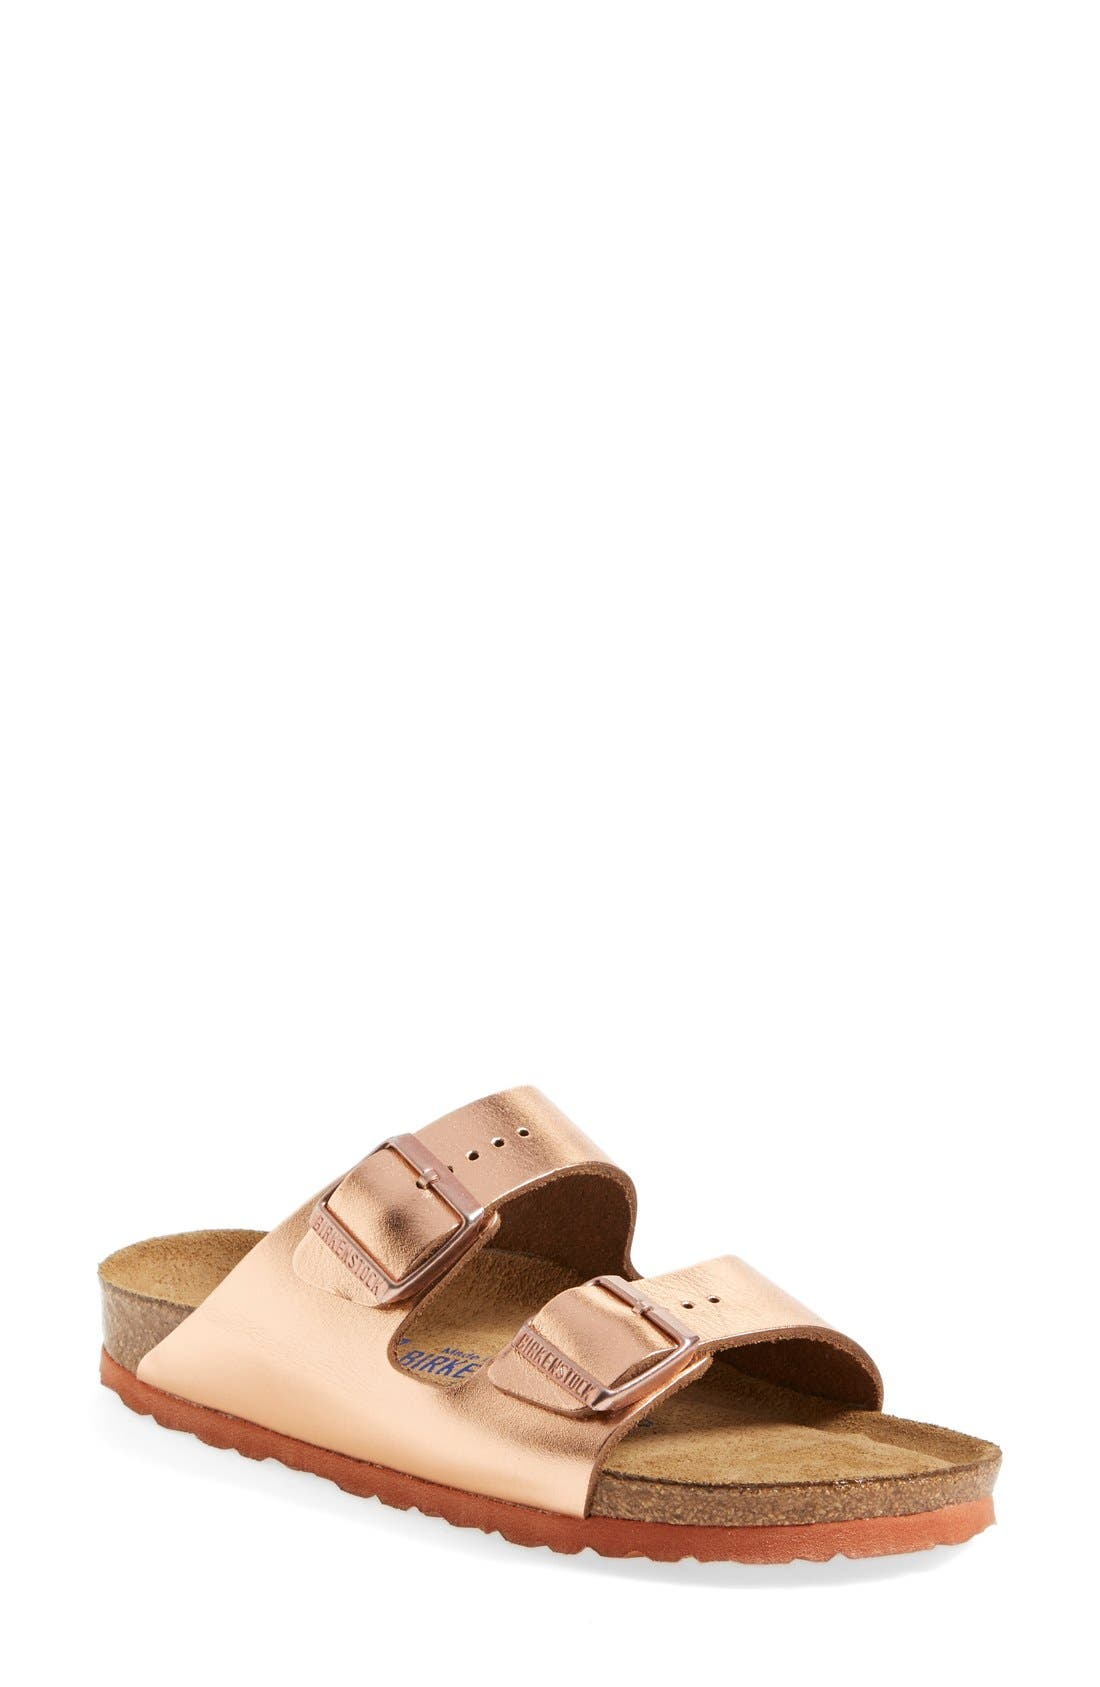 Main Image - Birkenstock 'Arizona' Soft Footbed Leather Sandal (Women)